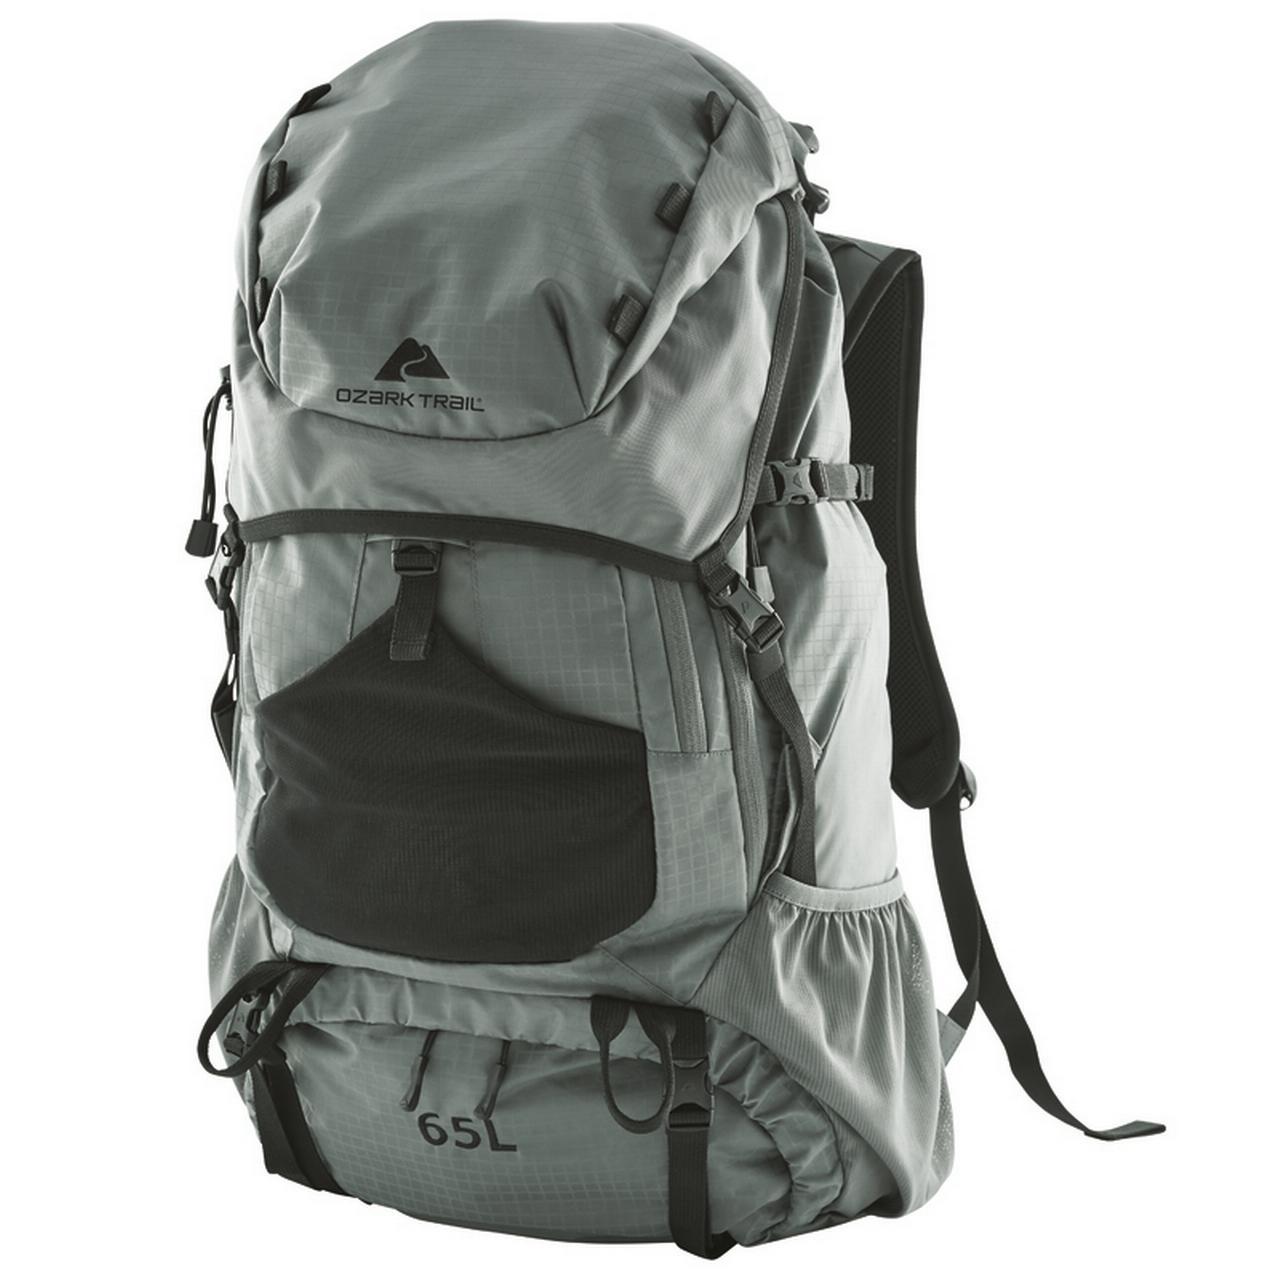 Ozark Trail 65L Stavern Hydration-Compatible Backpack